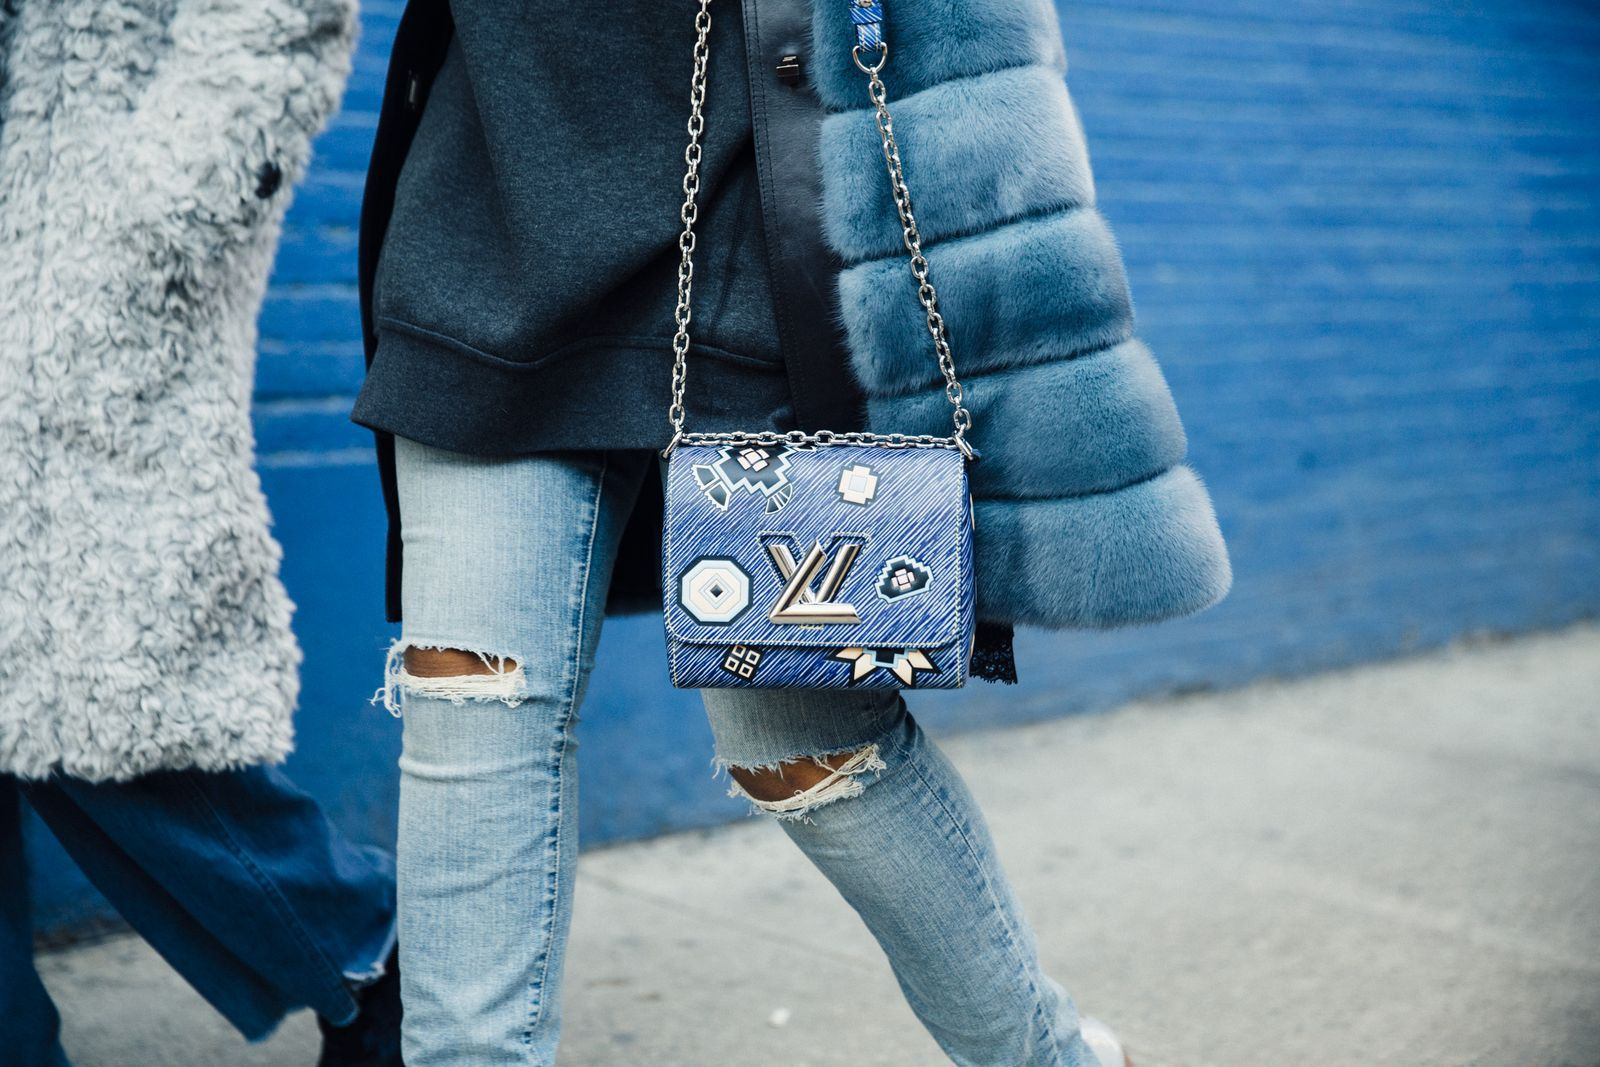 knockoff chloe handbags - What Designer Bag Has the Best Resale Value? - Racked